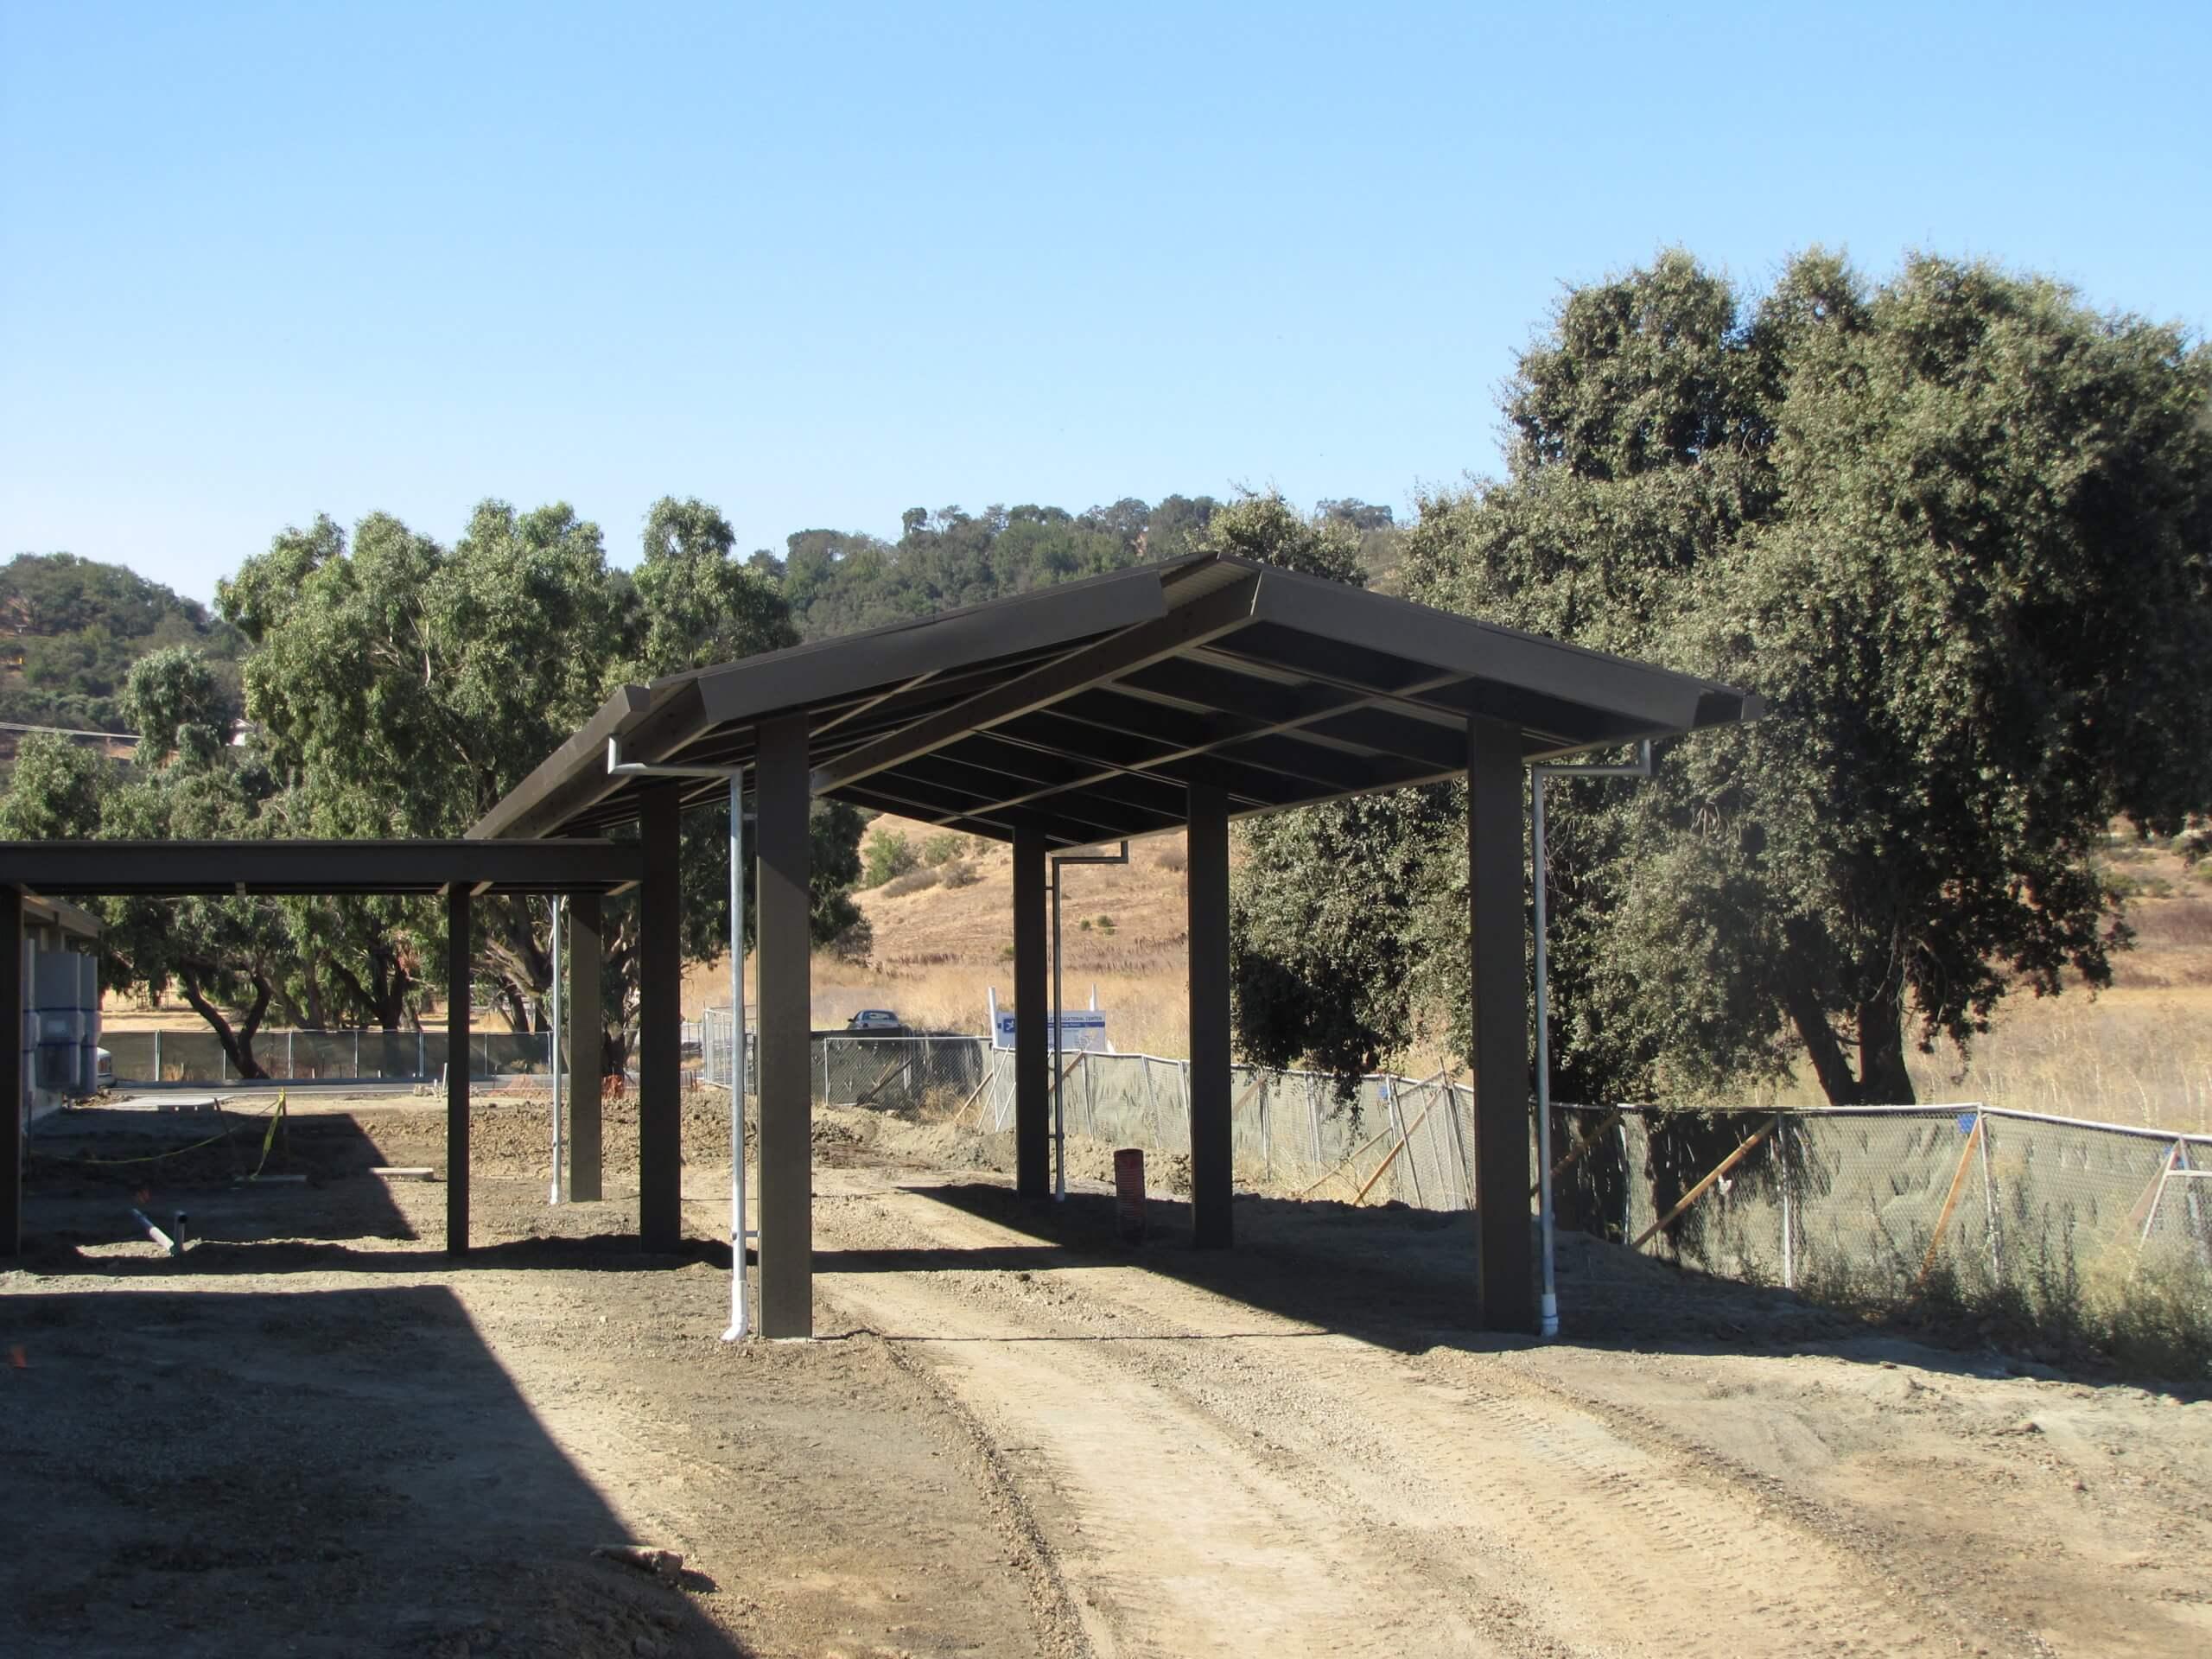 Coyote Valley School